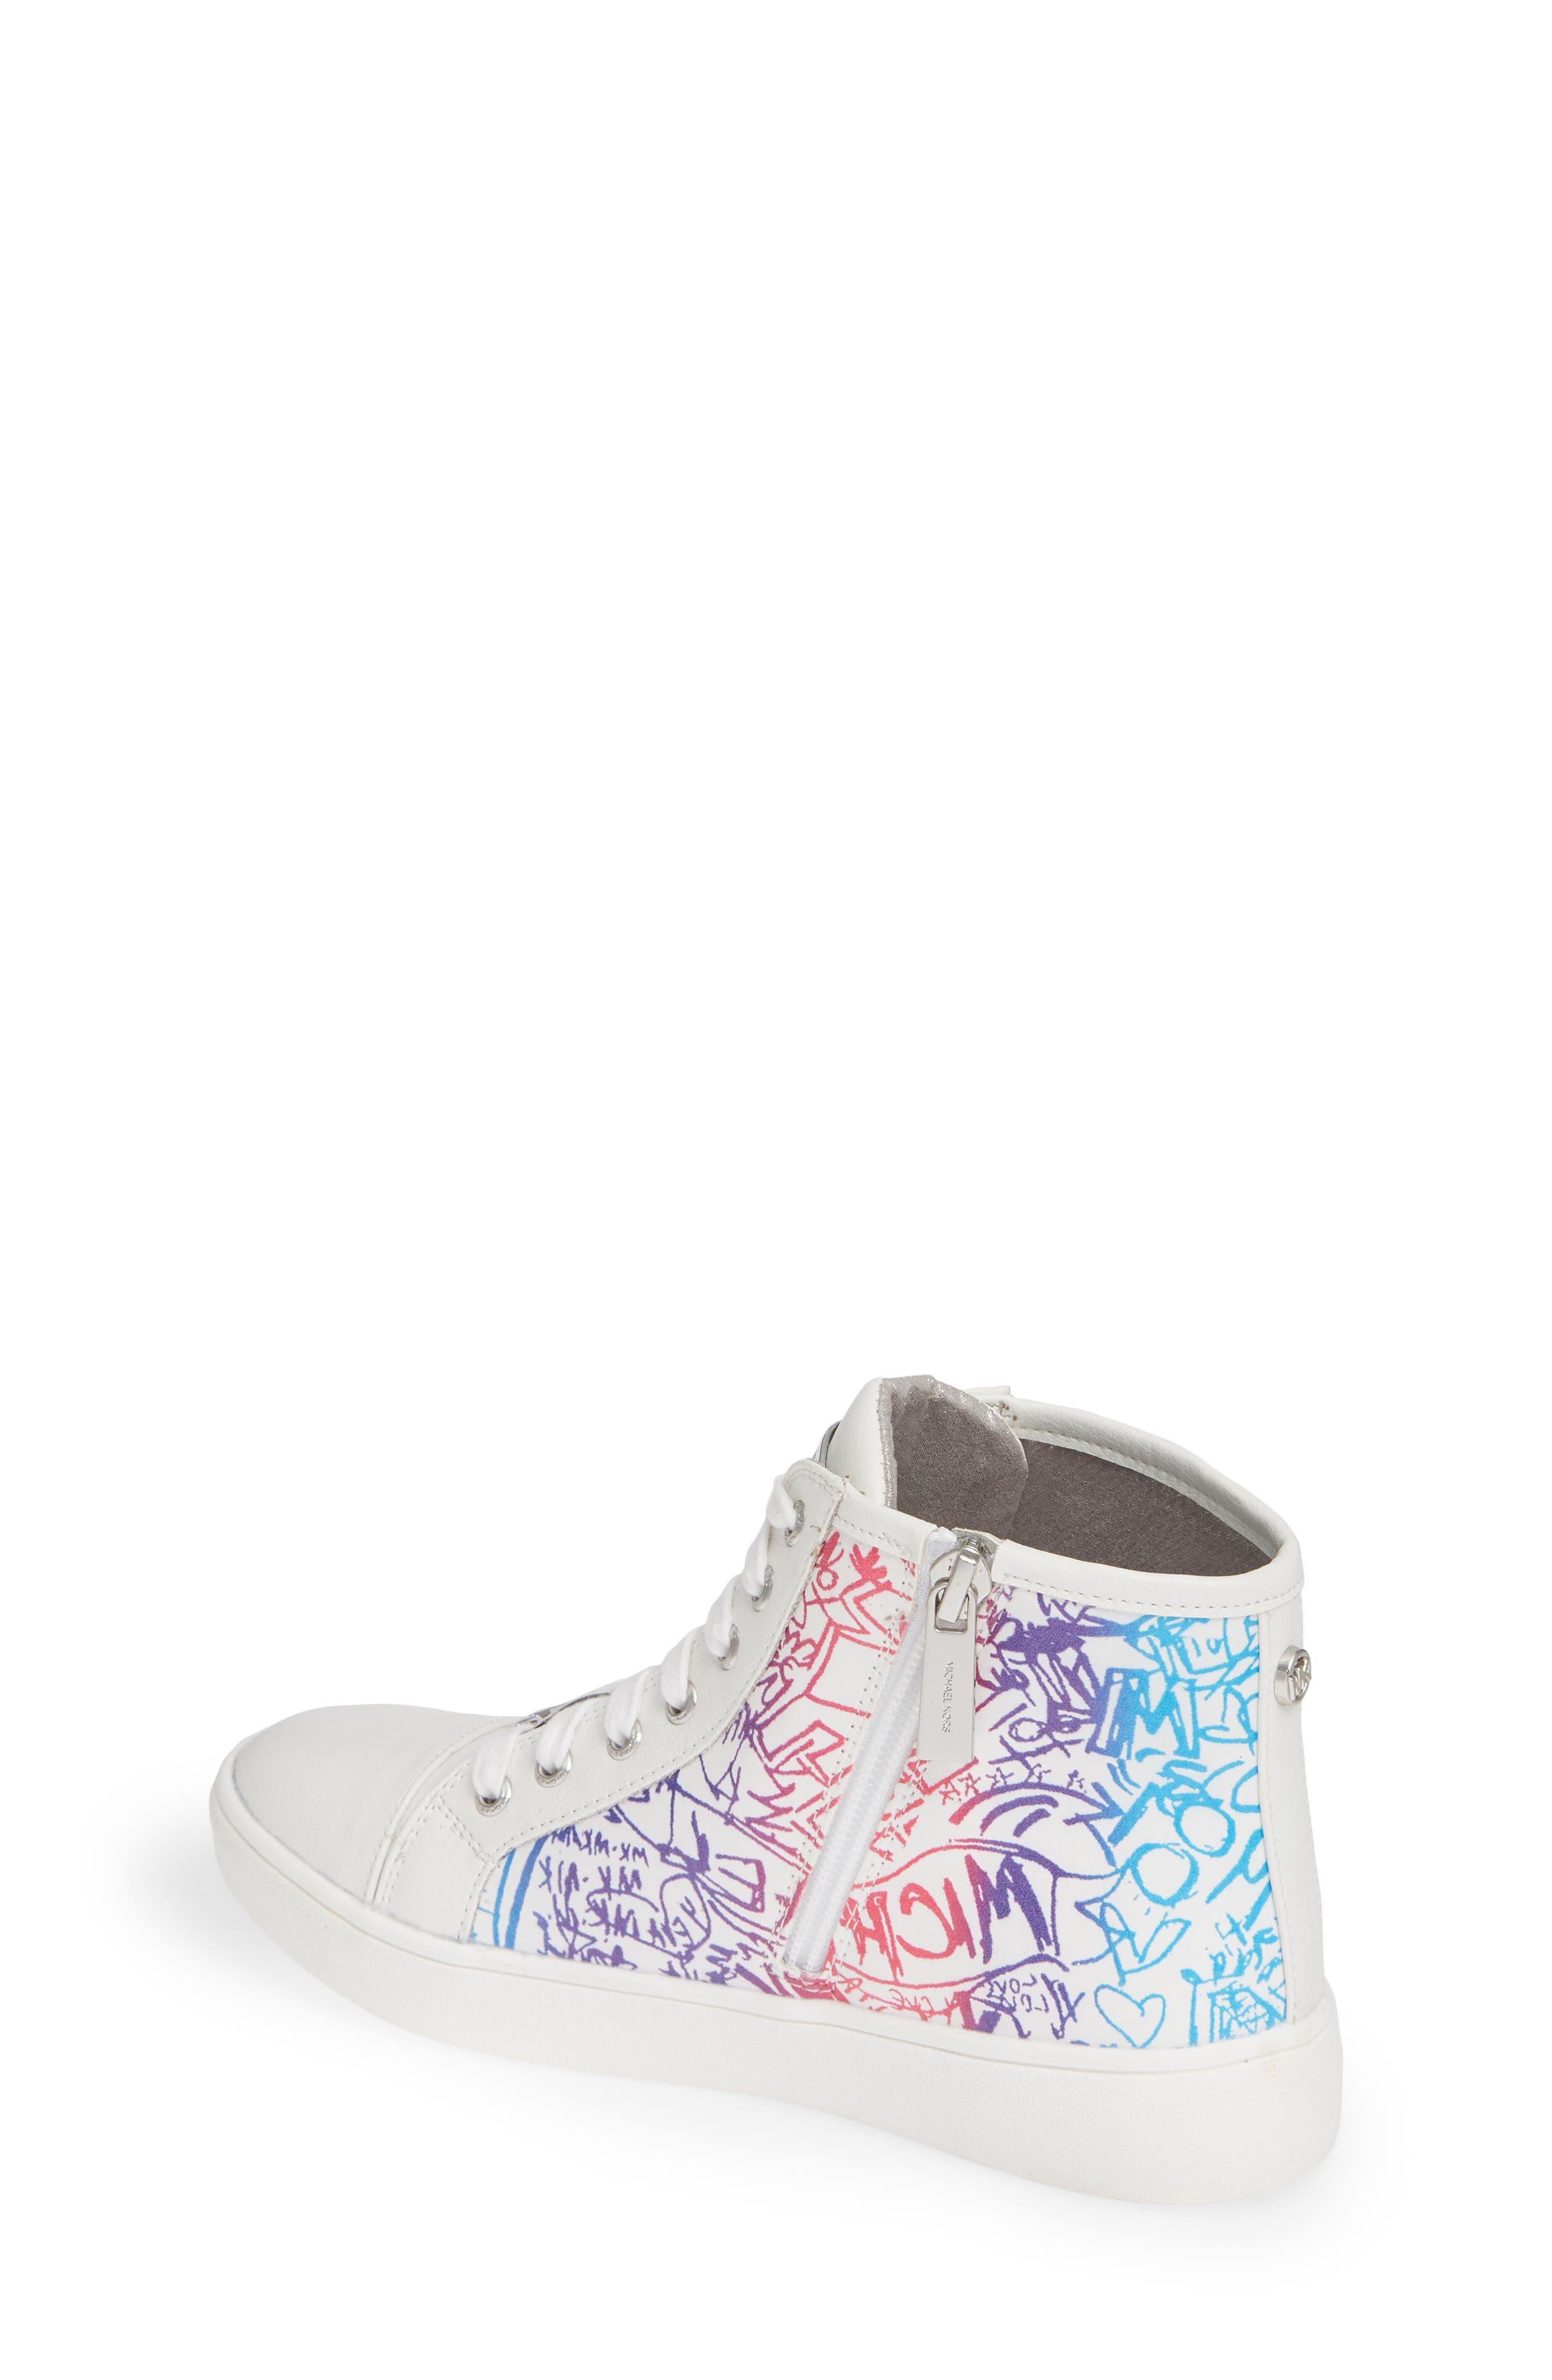 Ivy Spectra High Top Sneaker,                             Alternate thumbnail 2, color,                             WHITE MULTI